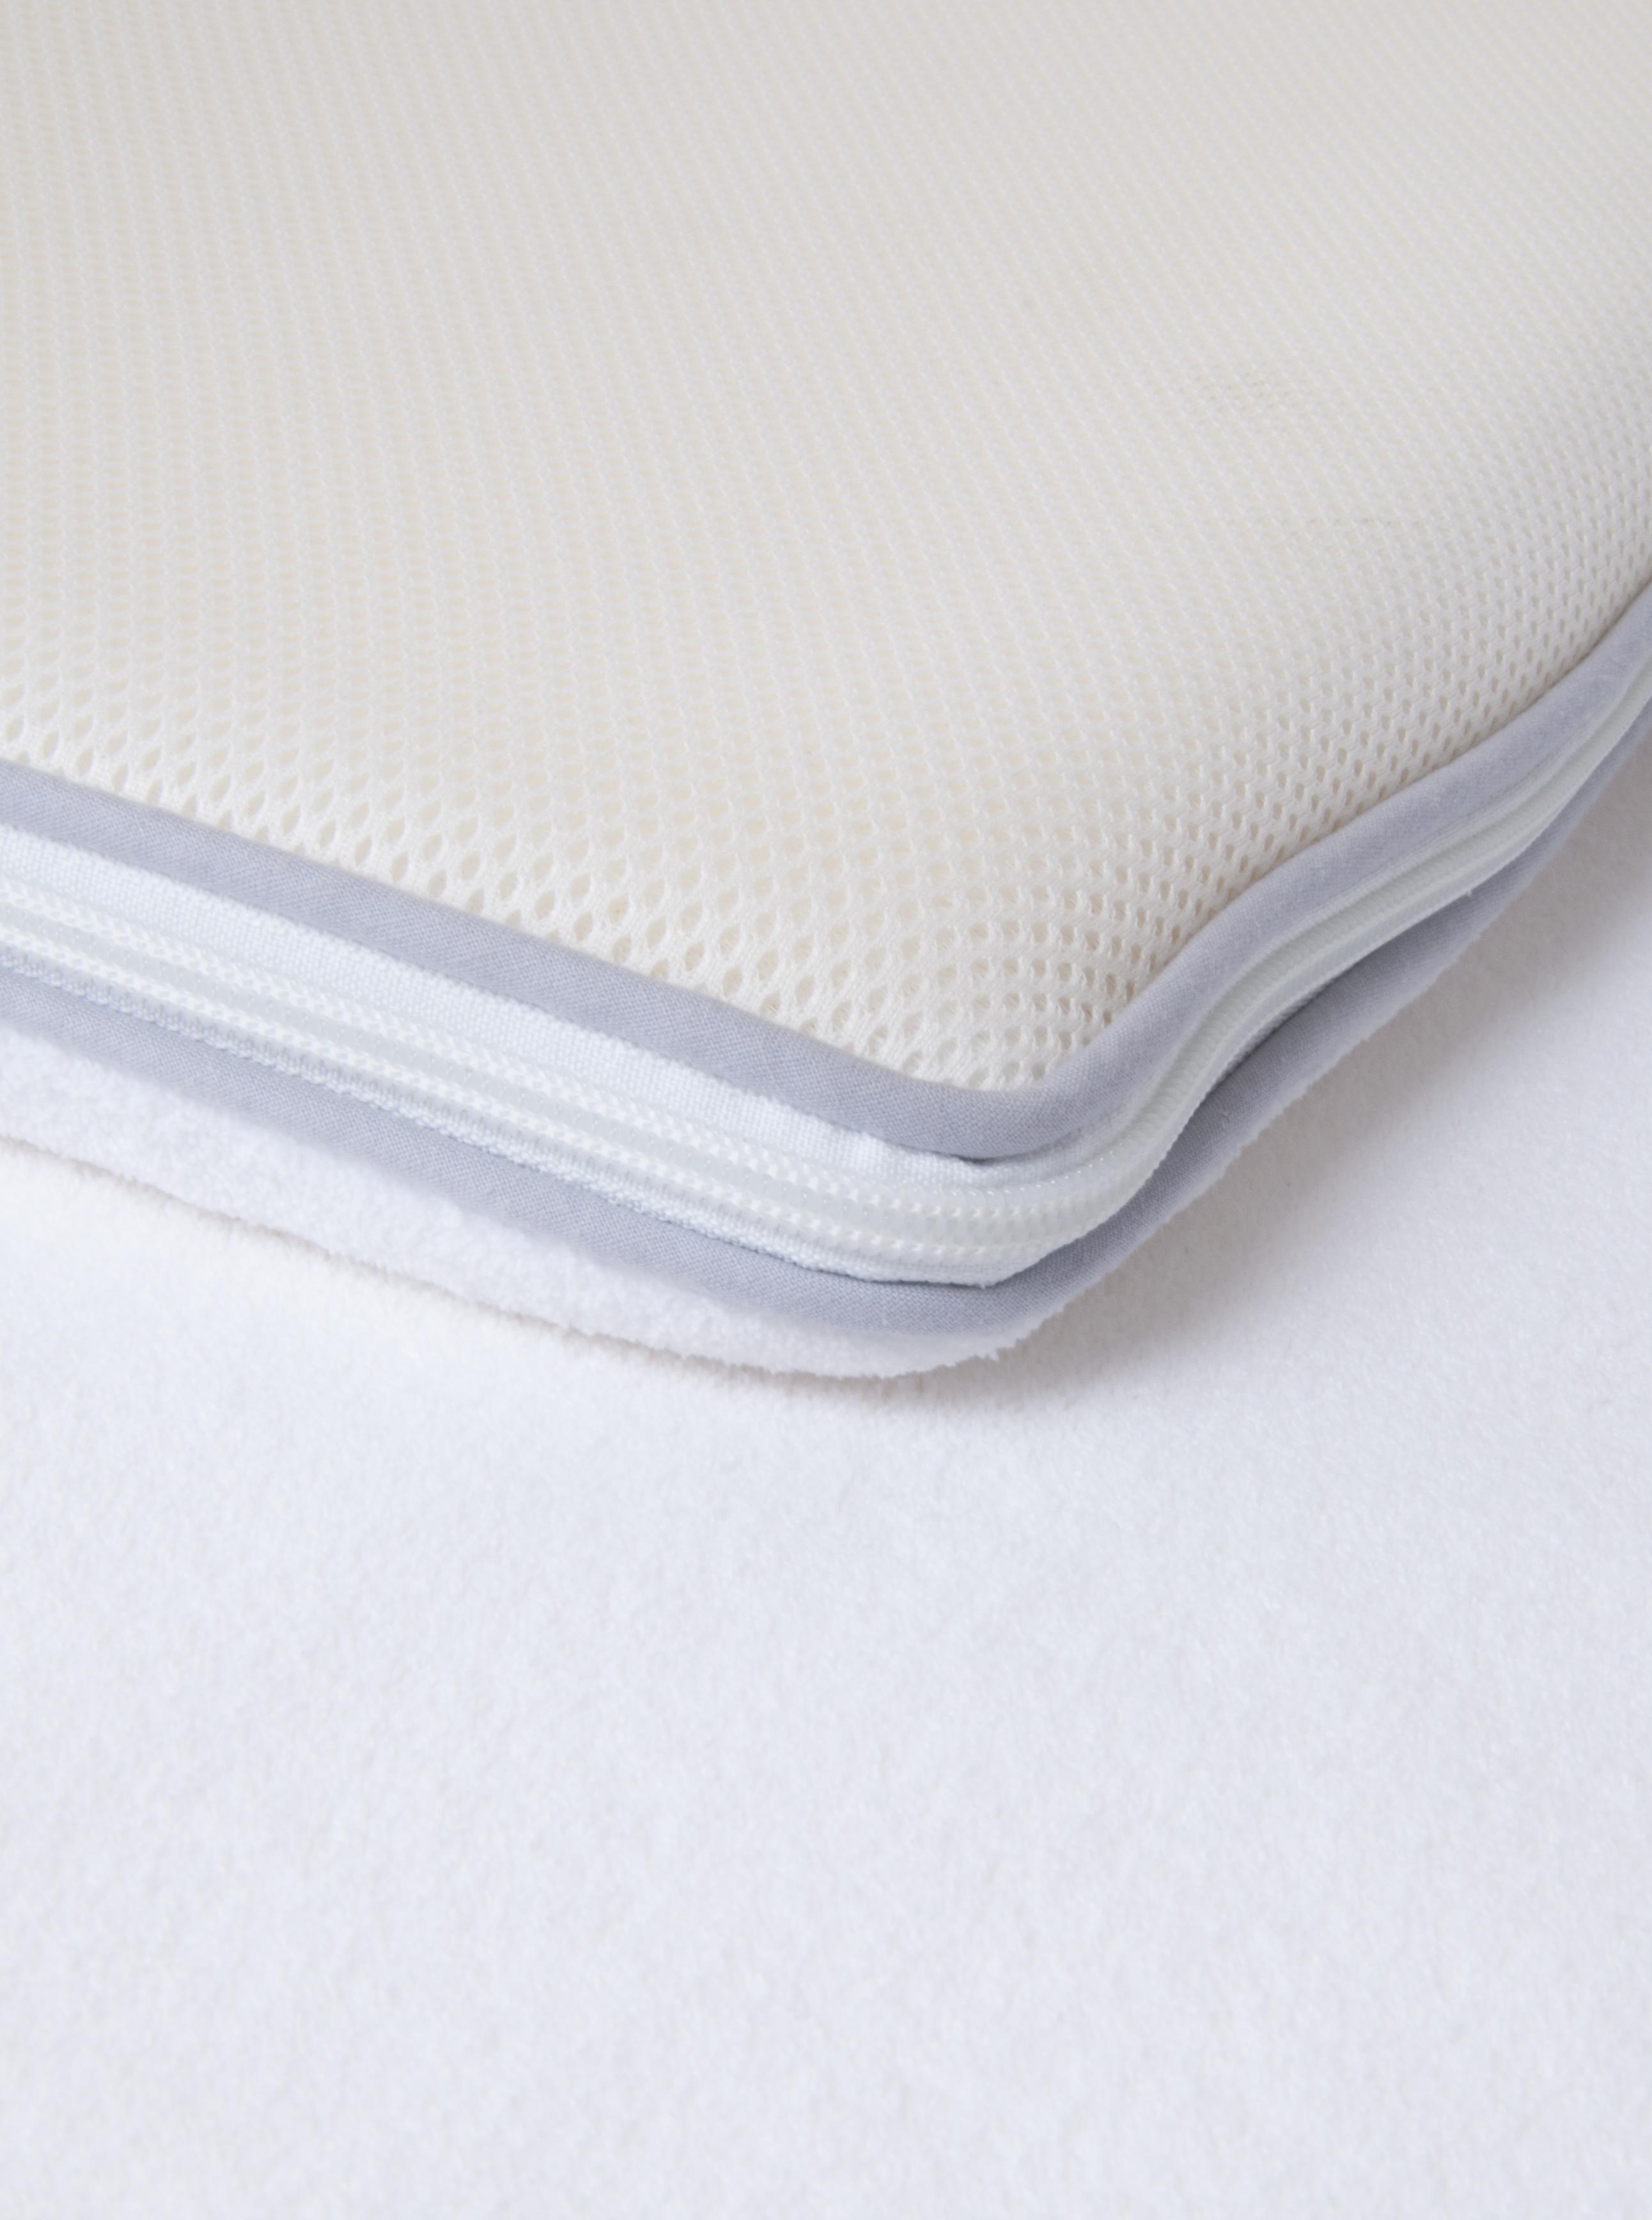 Single All Seasons Air Relax And Polar Fleece Memory Foam Mattress Topper Cover Ebay